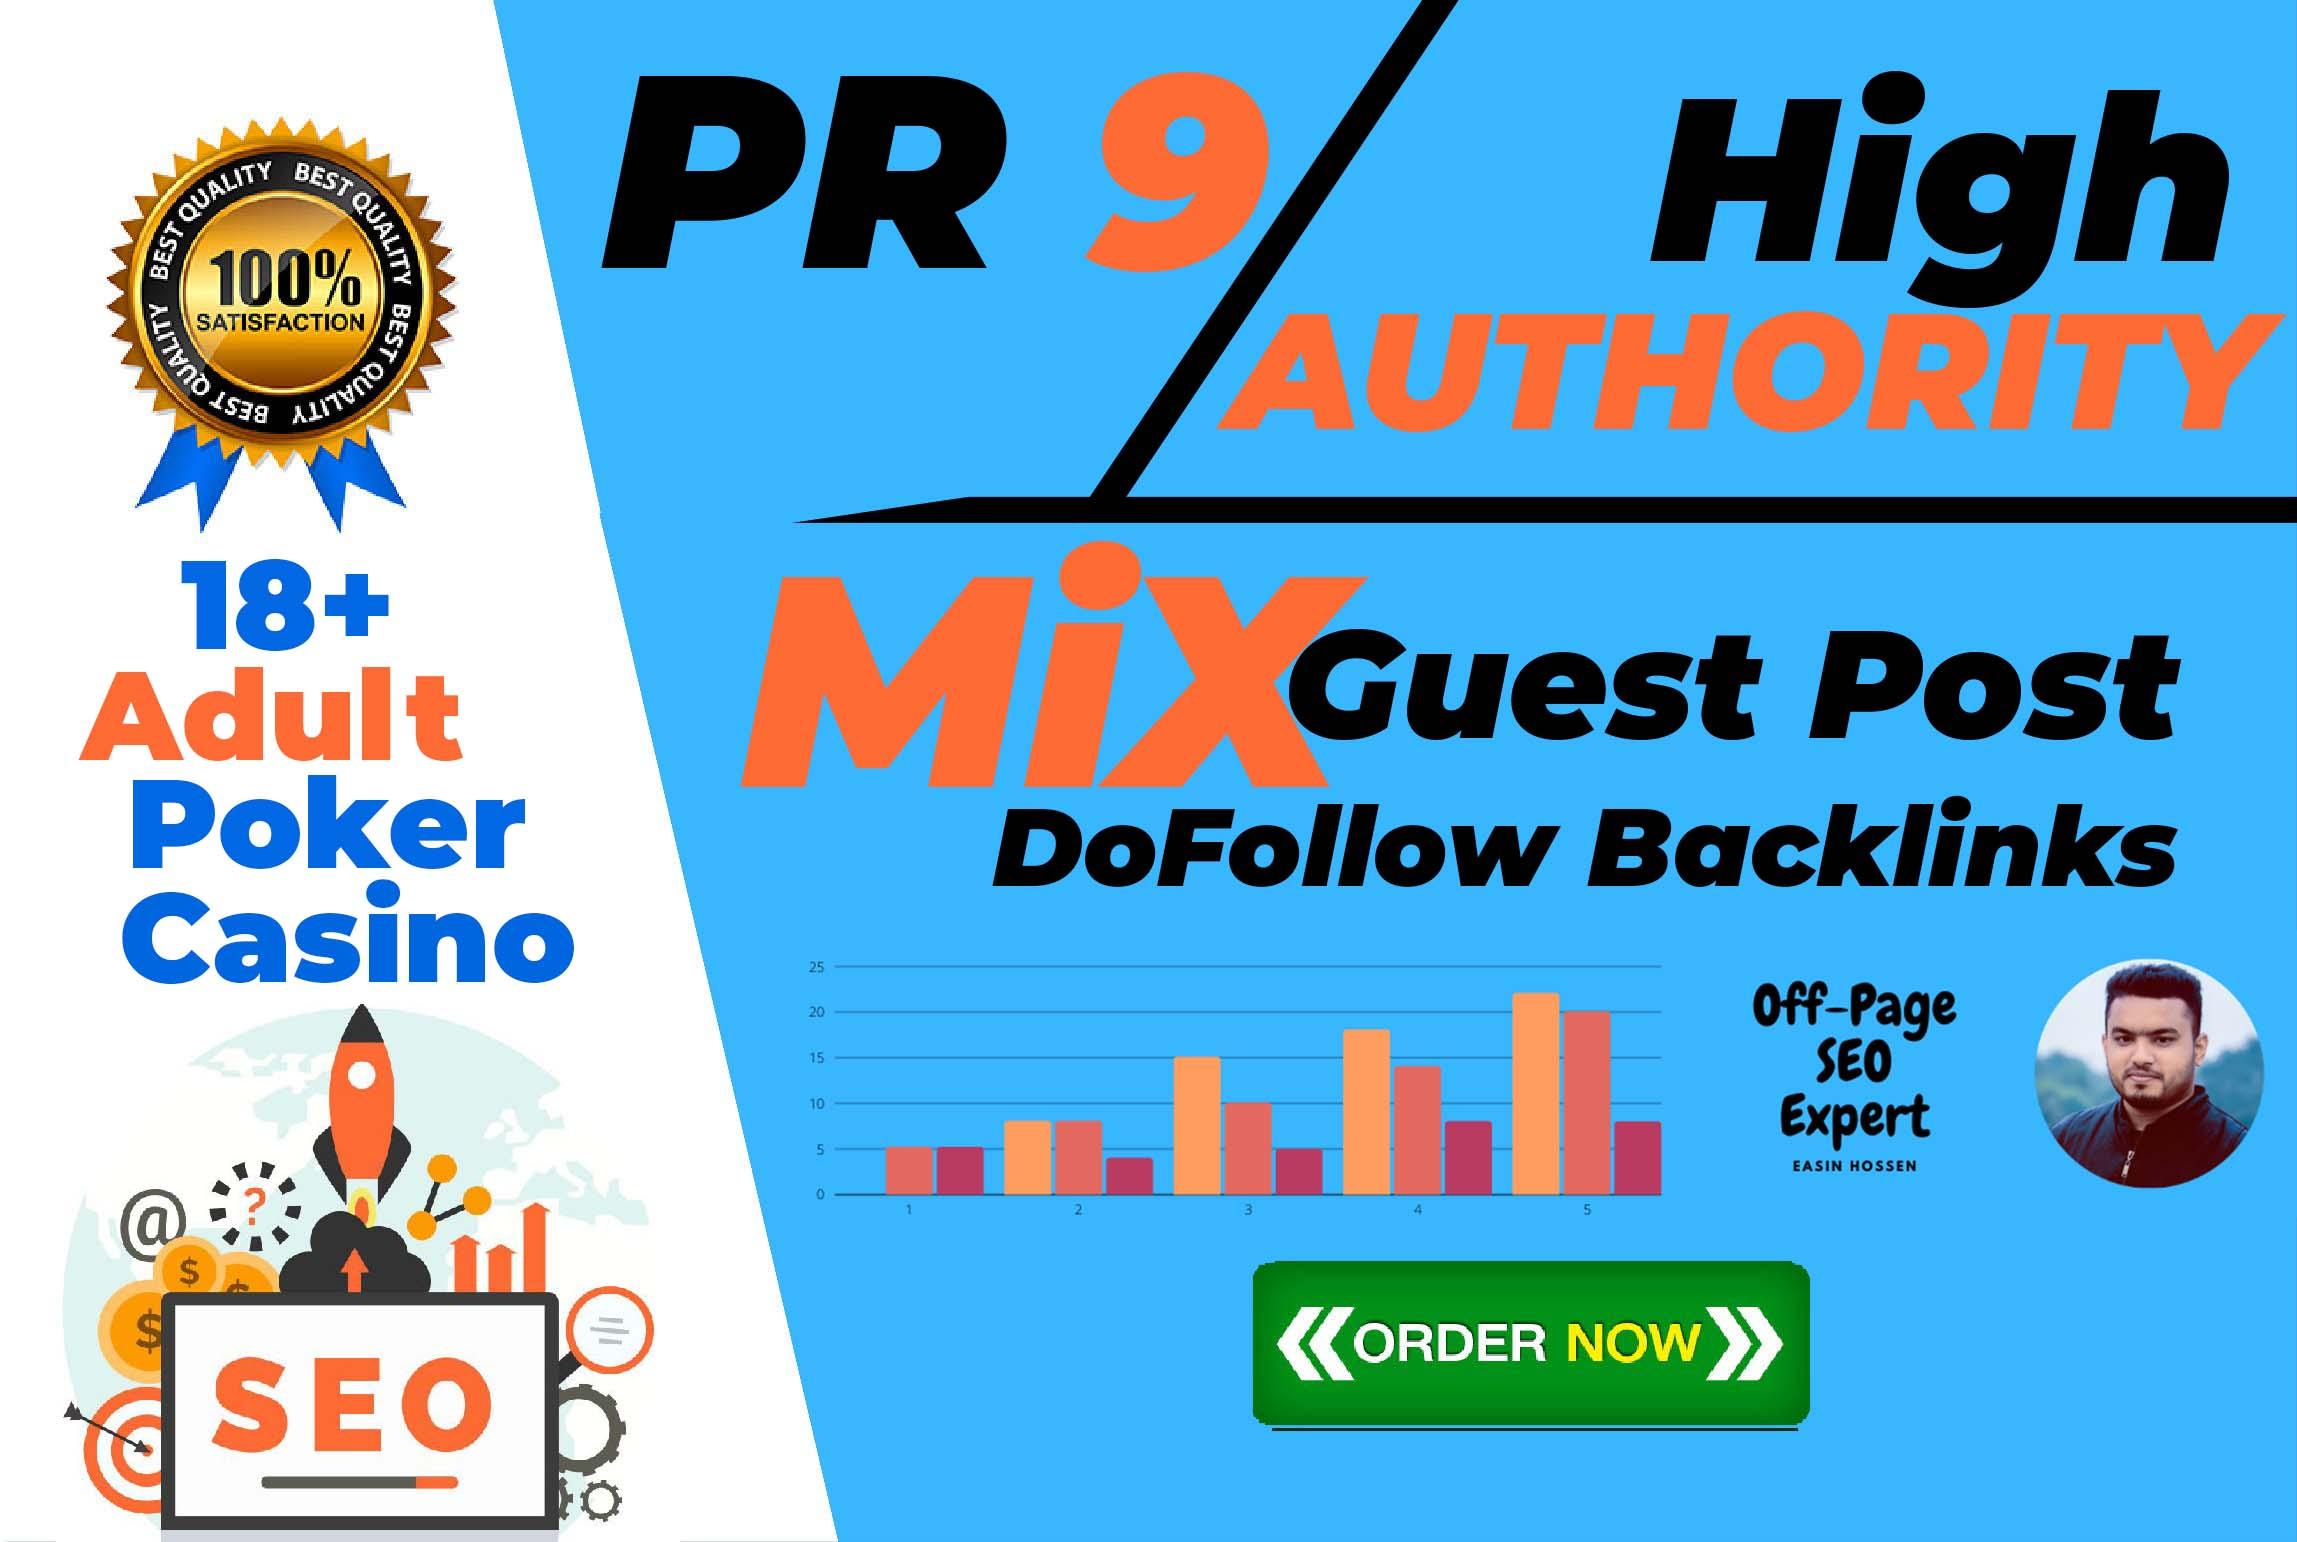 280 PowerLink Authority Backlinks DoFollow Permanent Blog Post